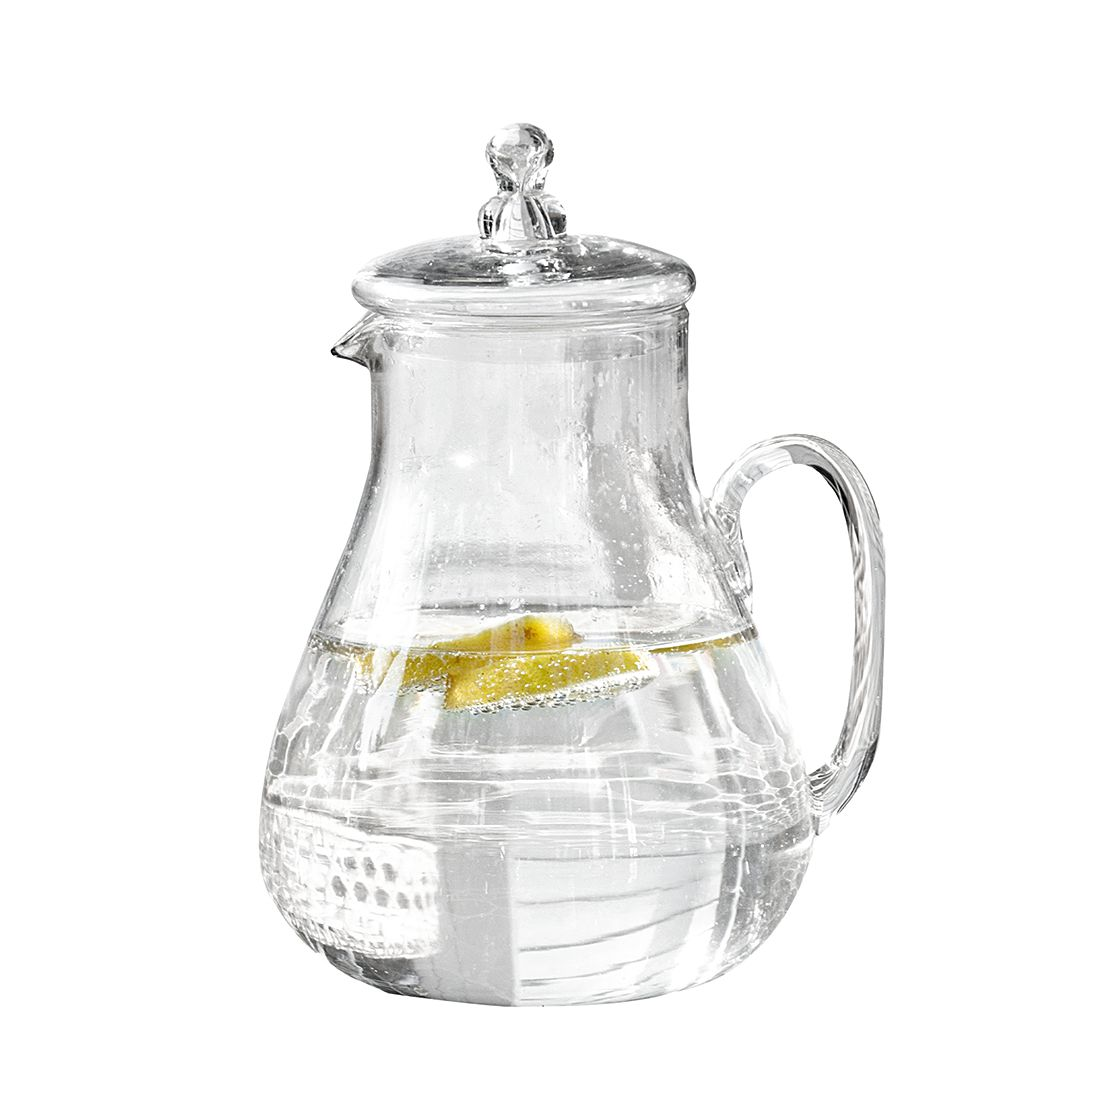 Krug Caithness – Glas klar, Loberon jetzt kaufen